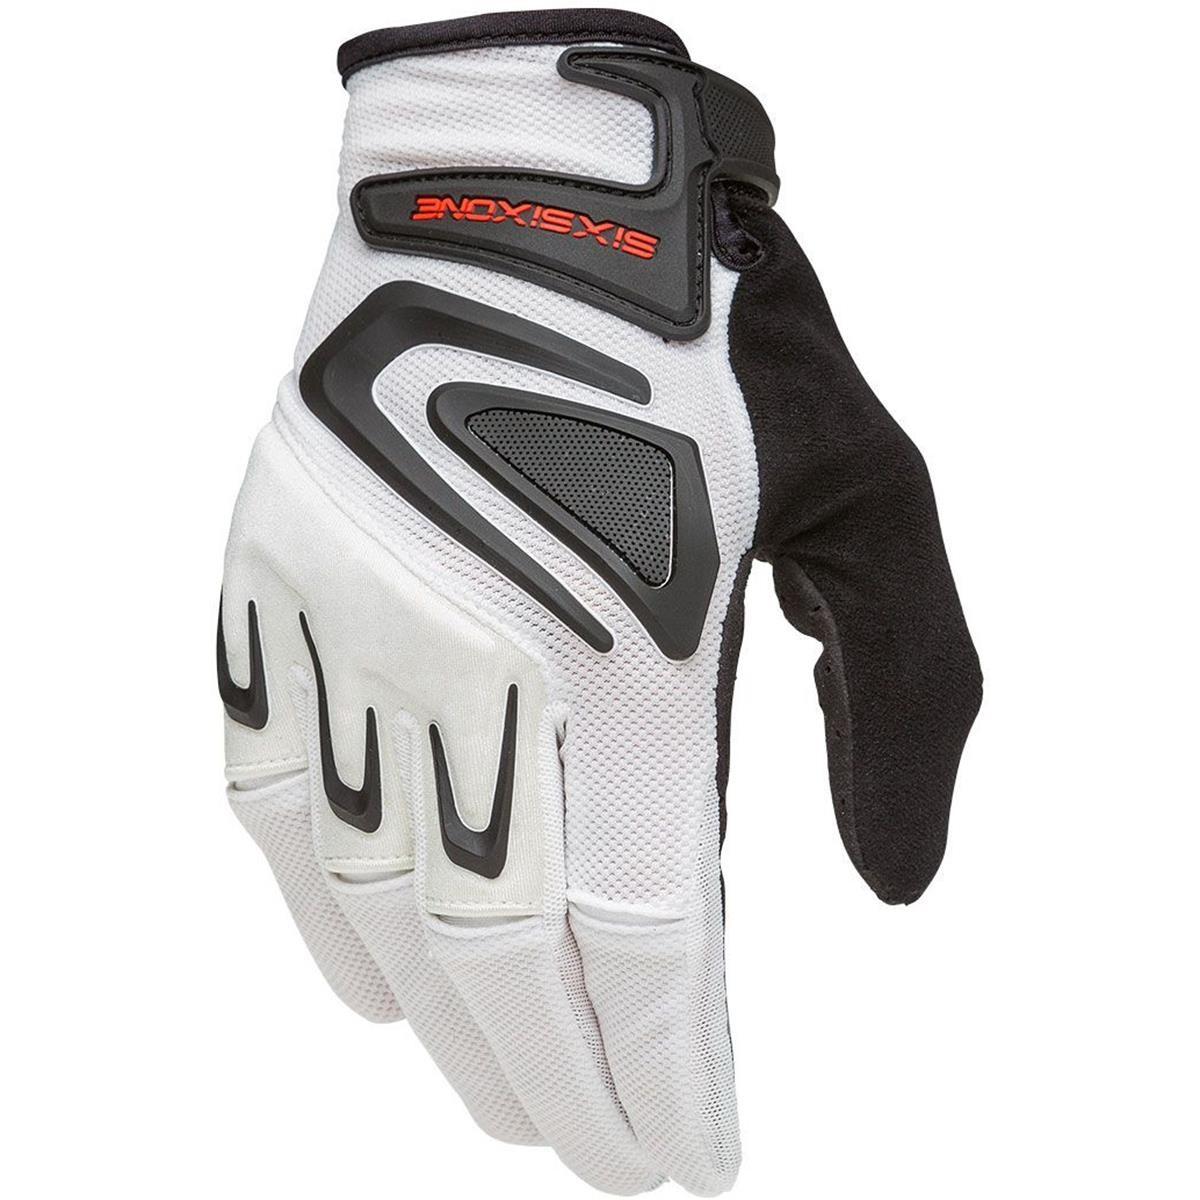 SixSixOne Handschuhe 661 Rage, S, Violett